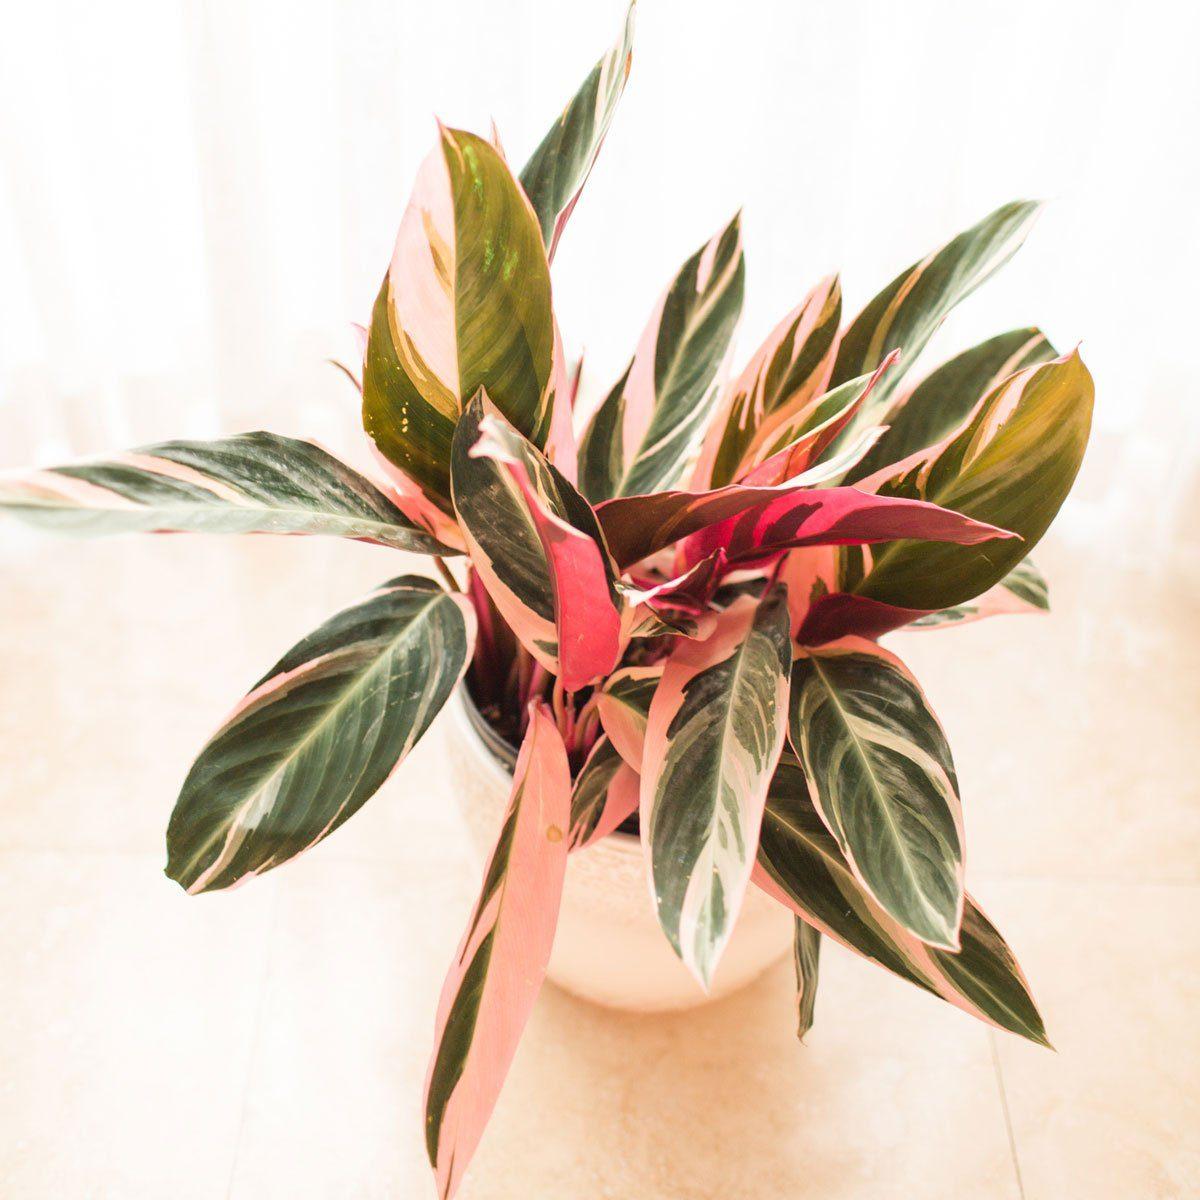 Stromanthe plant